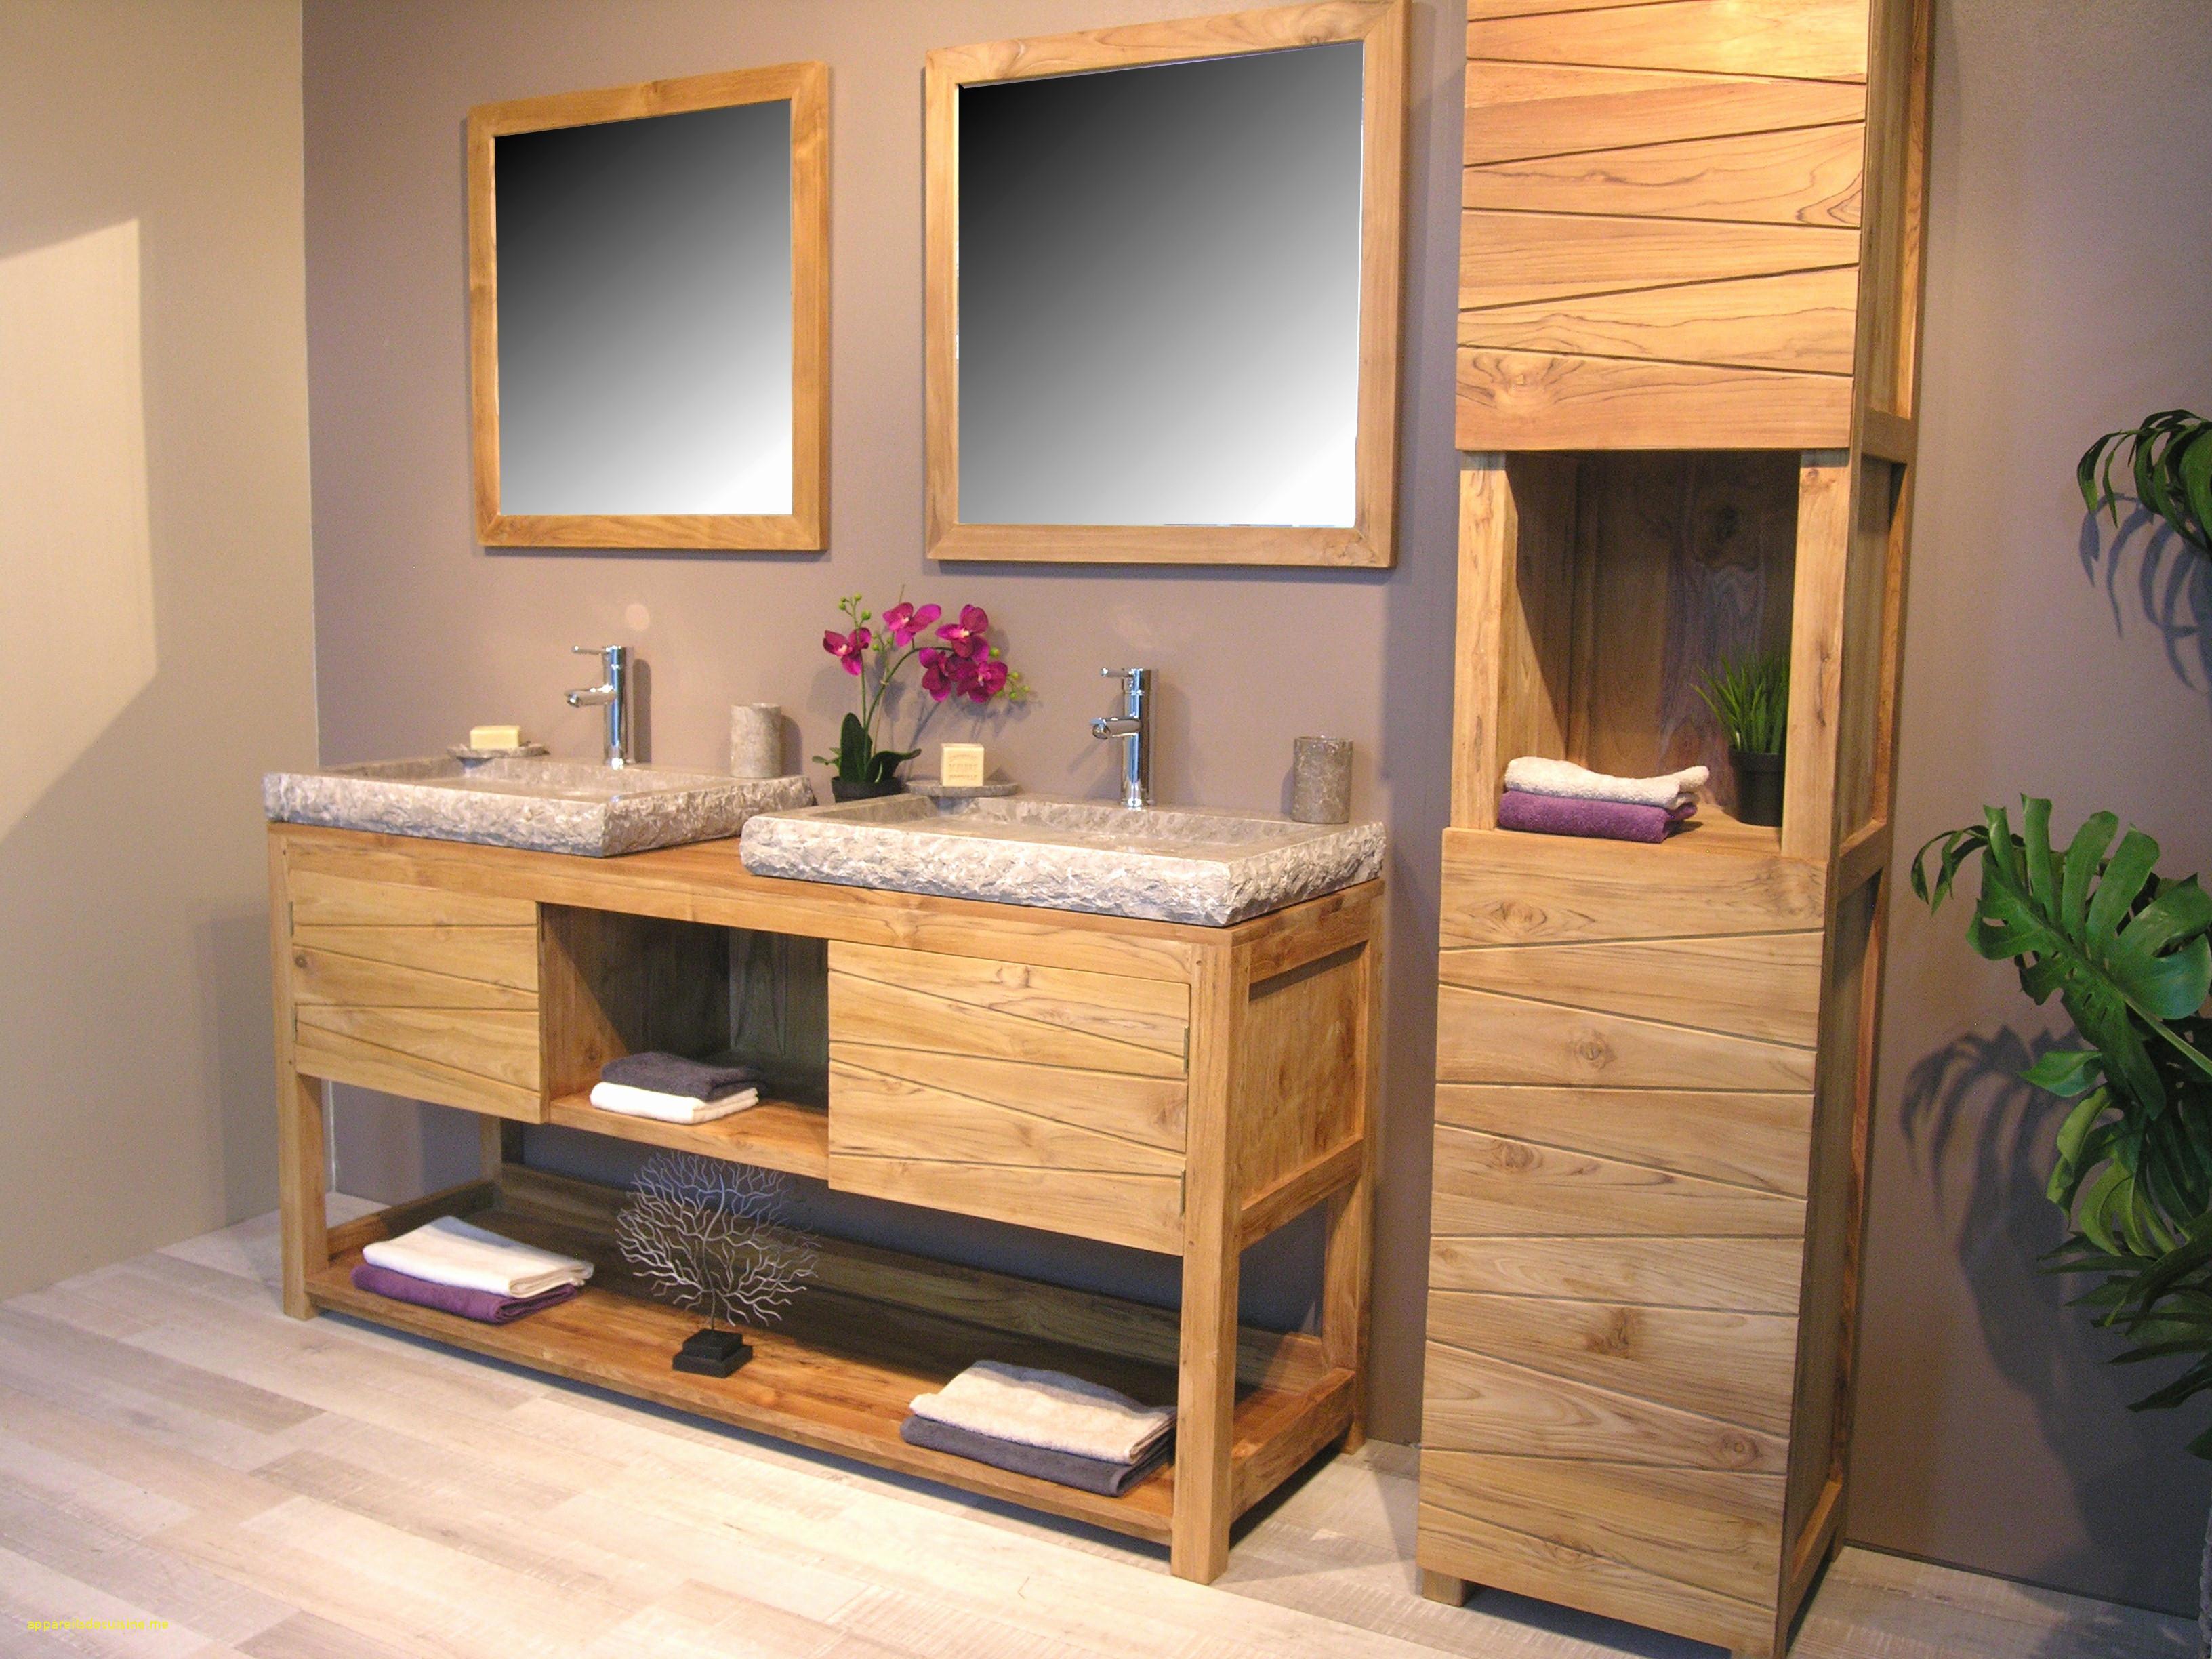 Lavabo Salle De Bain Ikea Luxe Stock Meuble Salle De Bain Lavabo Inspirant Résultat Supérieur Meuble